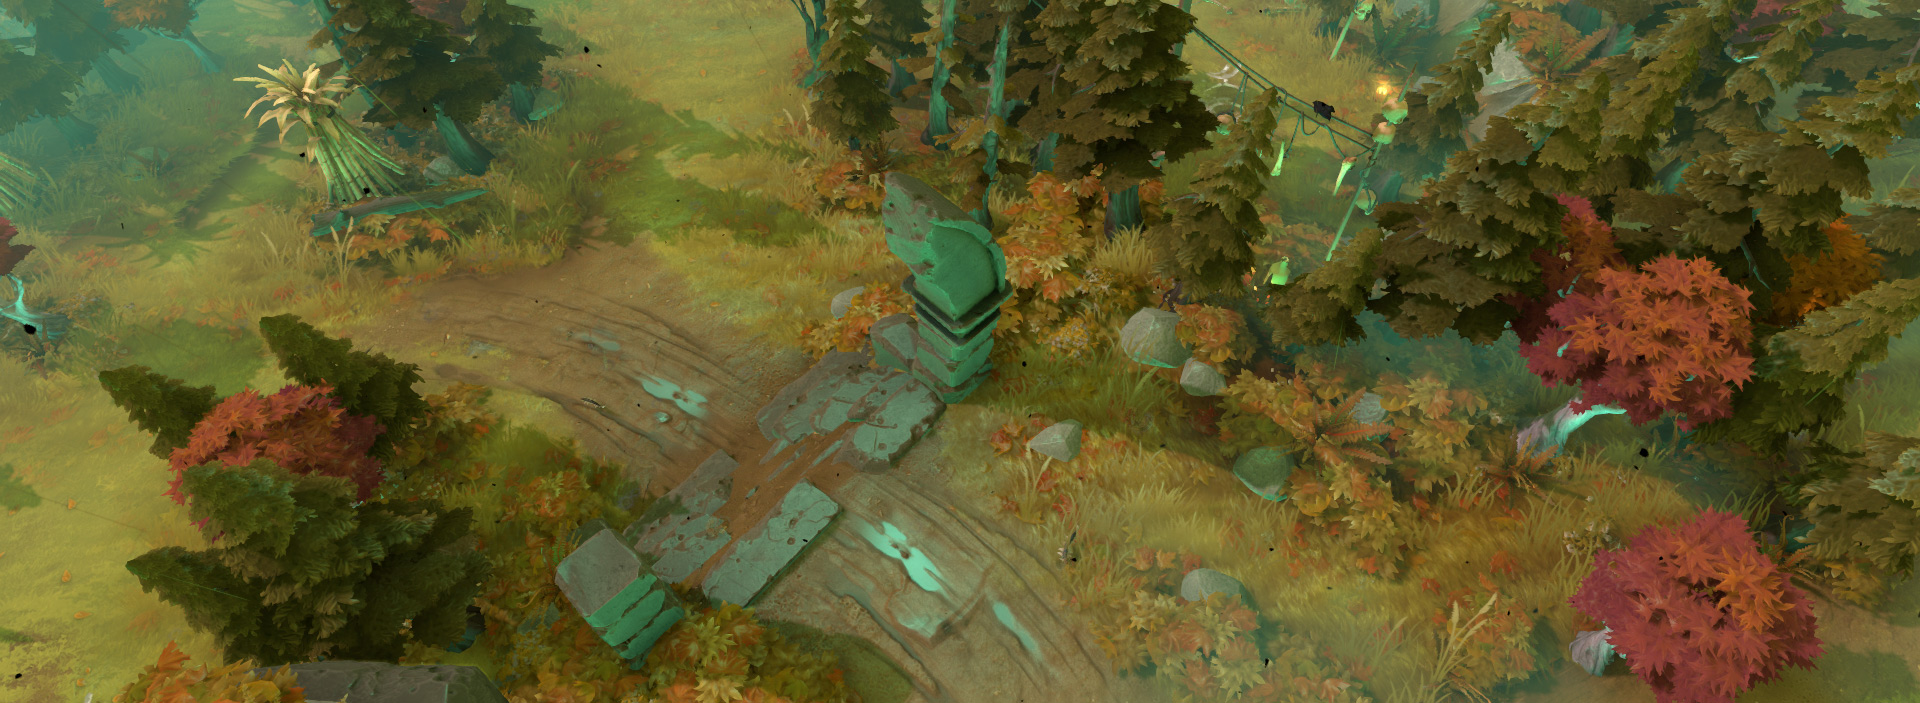 Autumn Terrain Weather Pestilence Preview 2.jpg